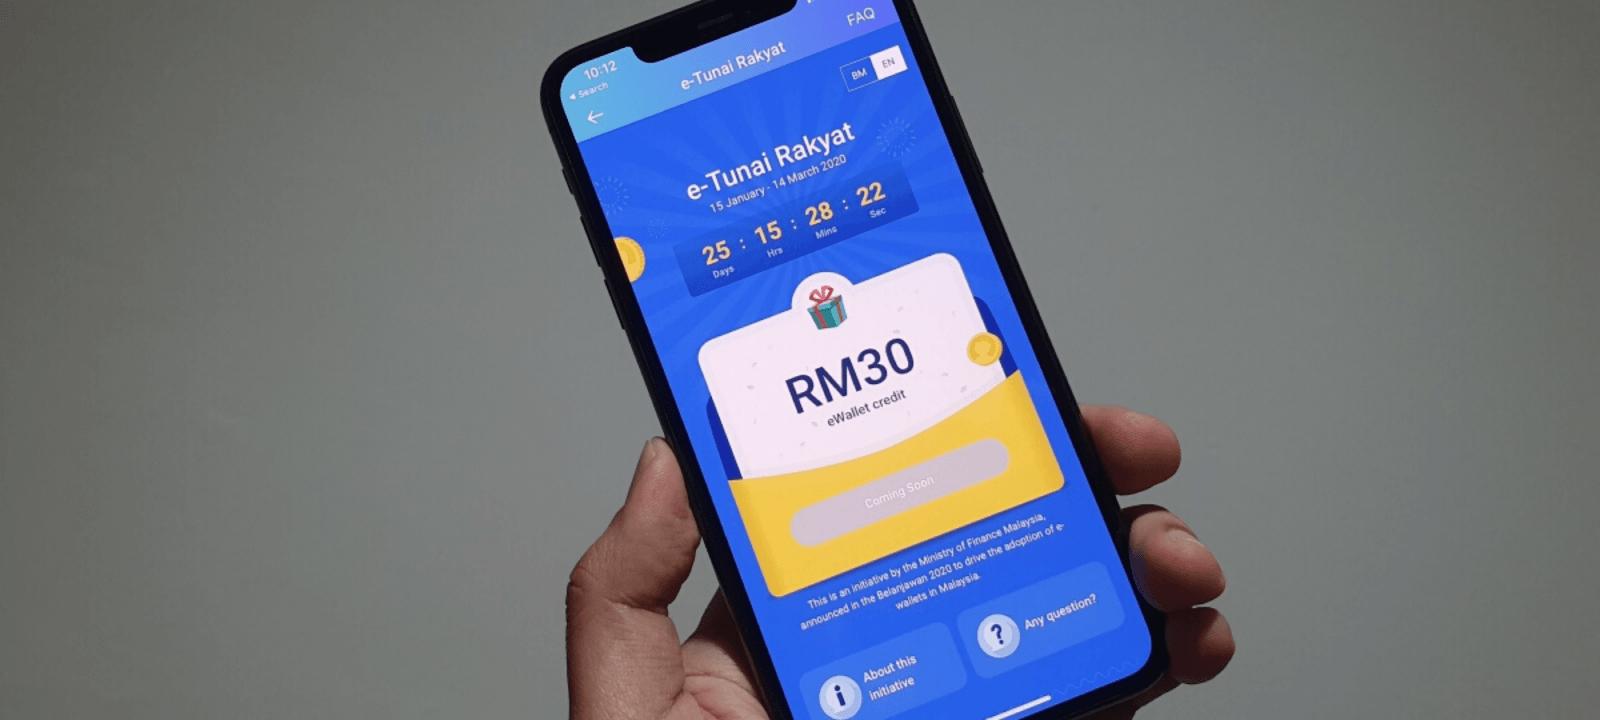 You Can Claim RM30 e-Tunai Rakyat Initiative with TNG eWallet, Boost or GrabPay